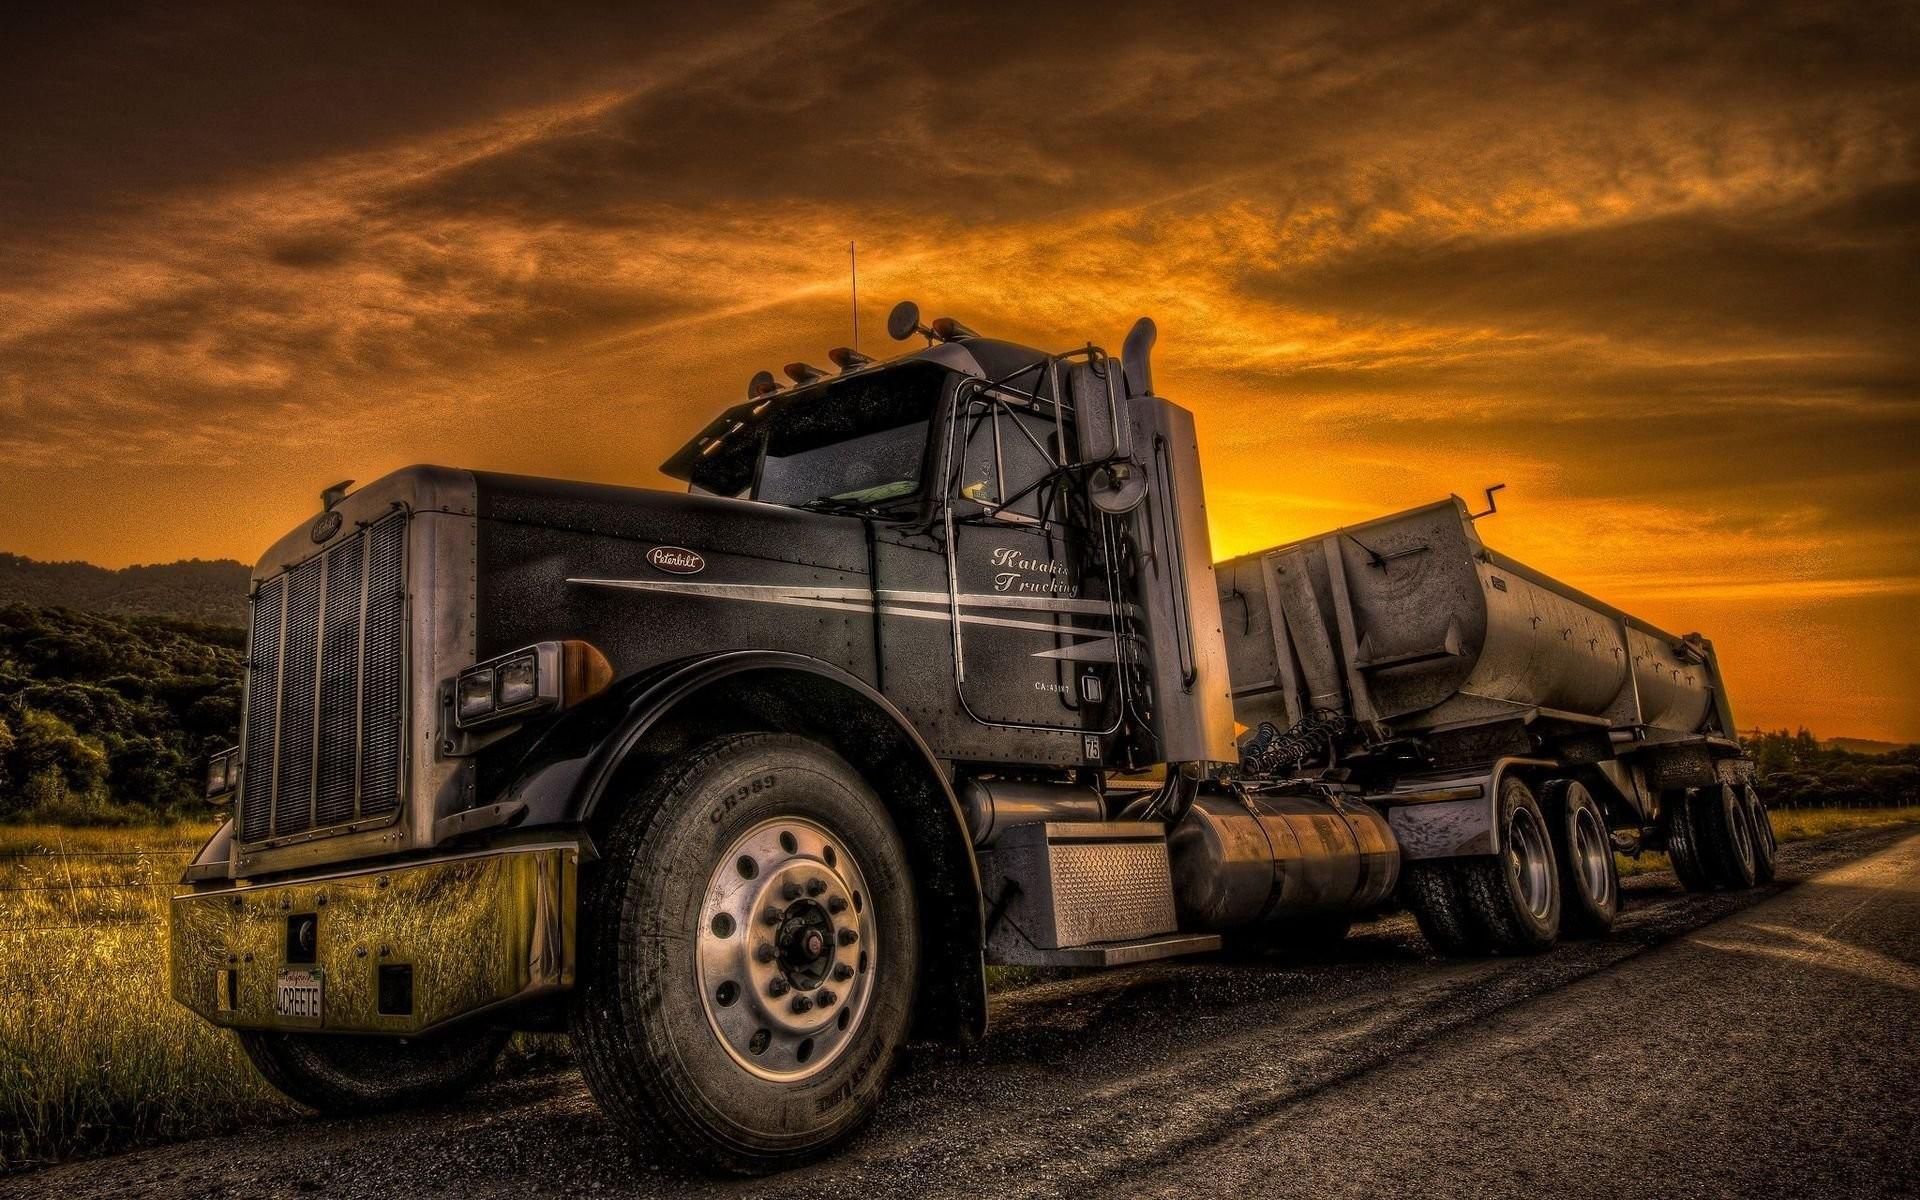 Hd Wallpapers Cool Trucks With Girls 1600 X 1000 301 Kb Jpeg | HD .